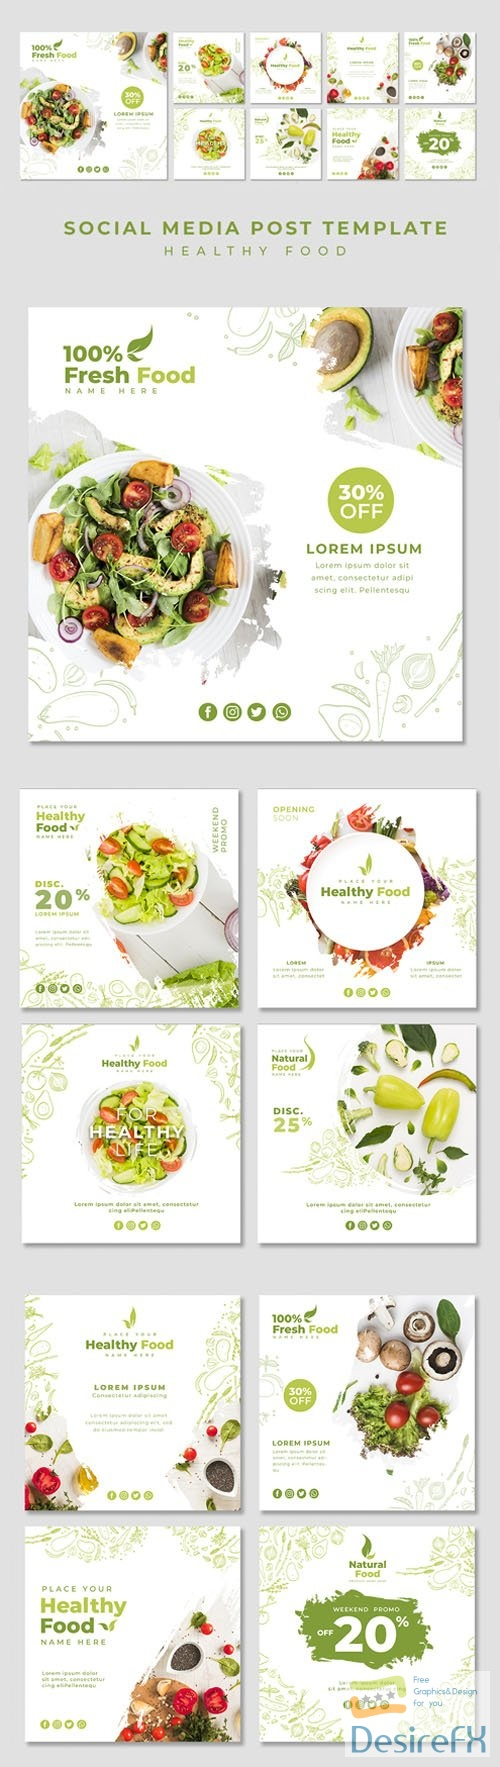 Healthy Food - Restaurant Social Media Post PSD Template